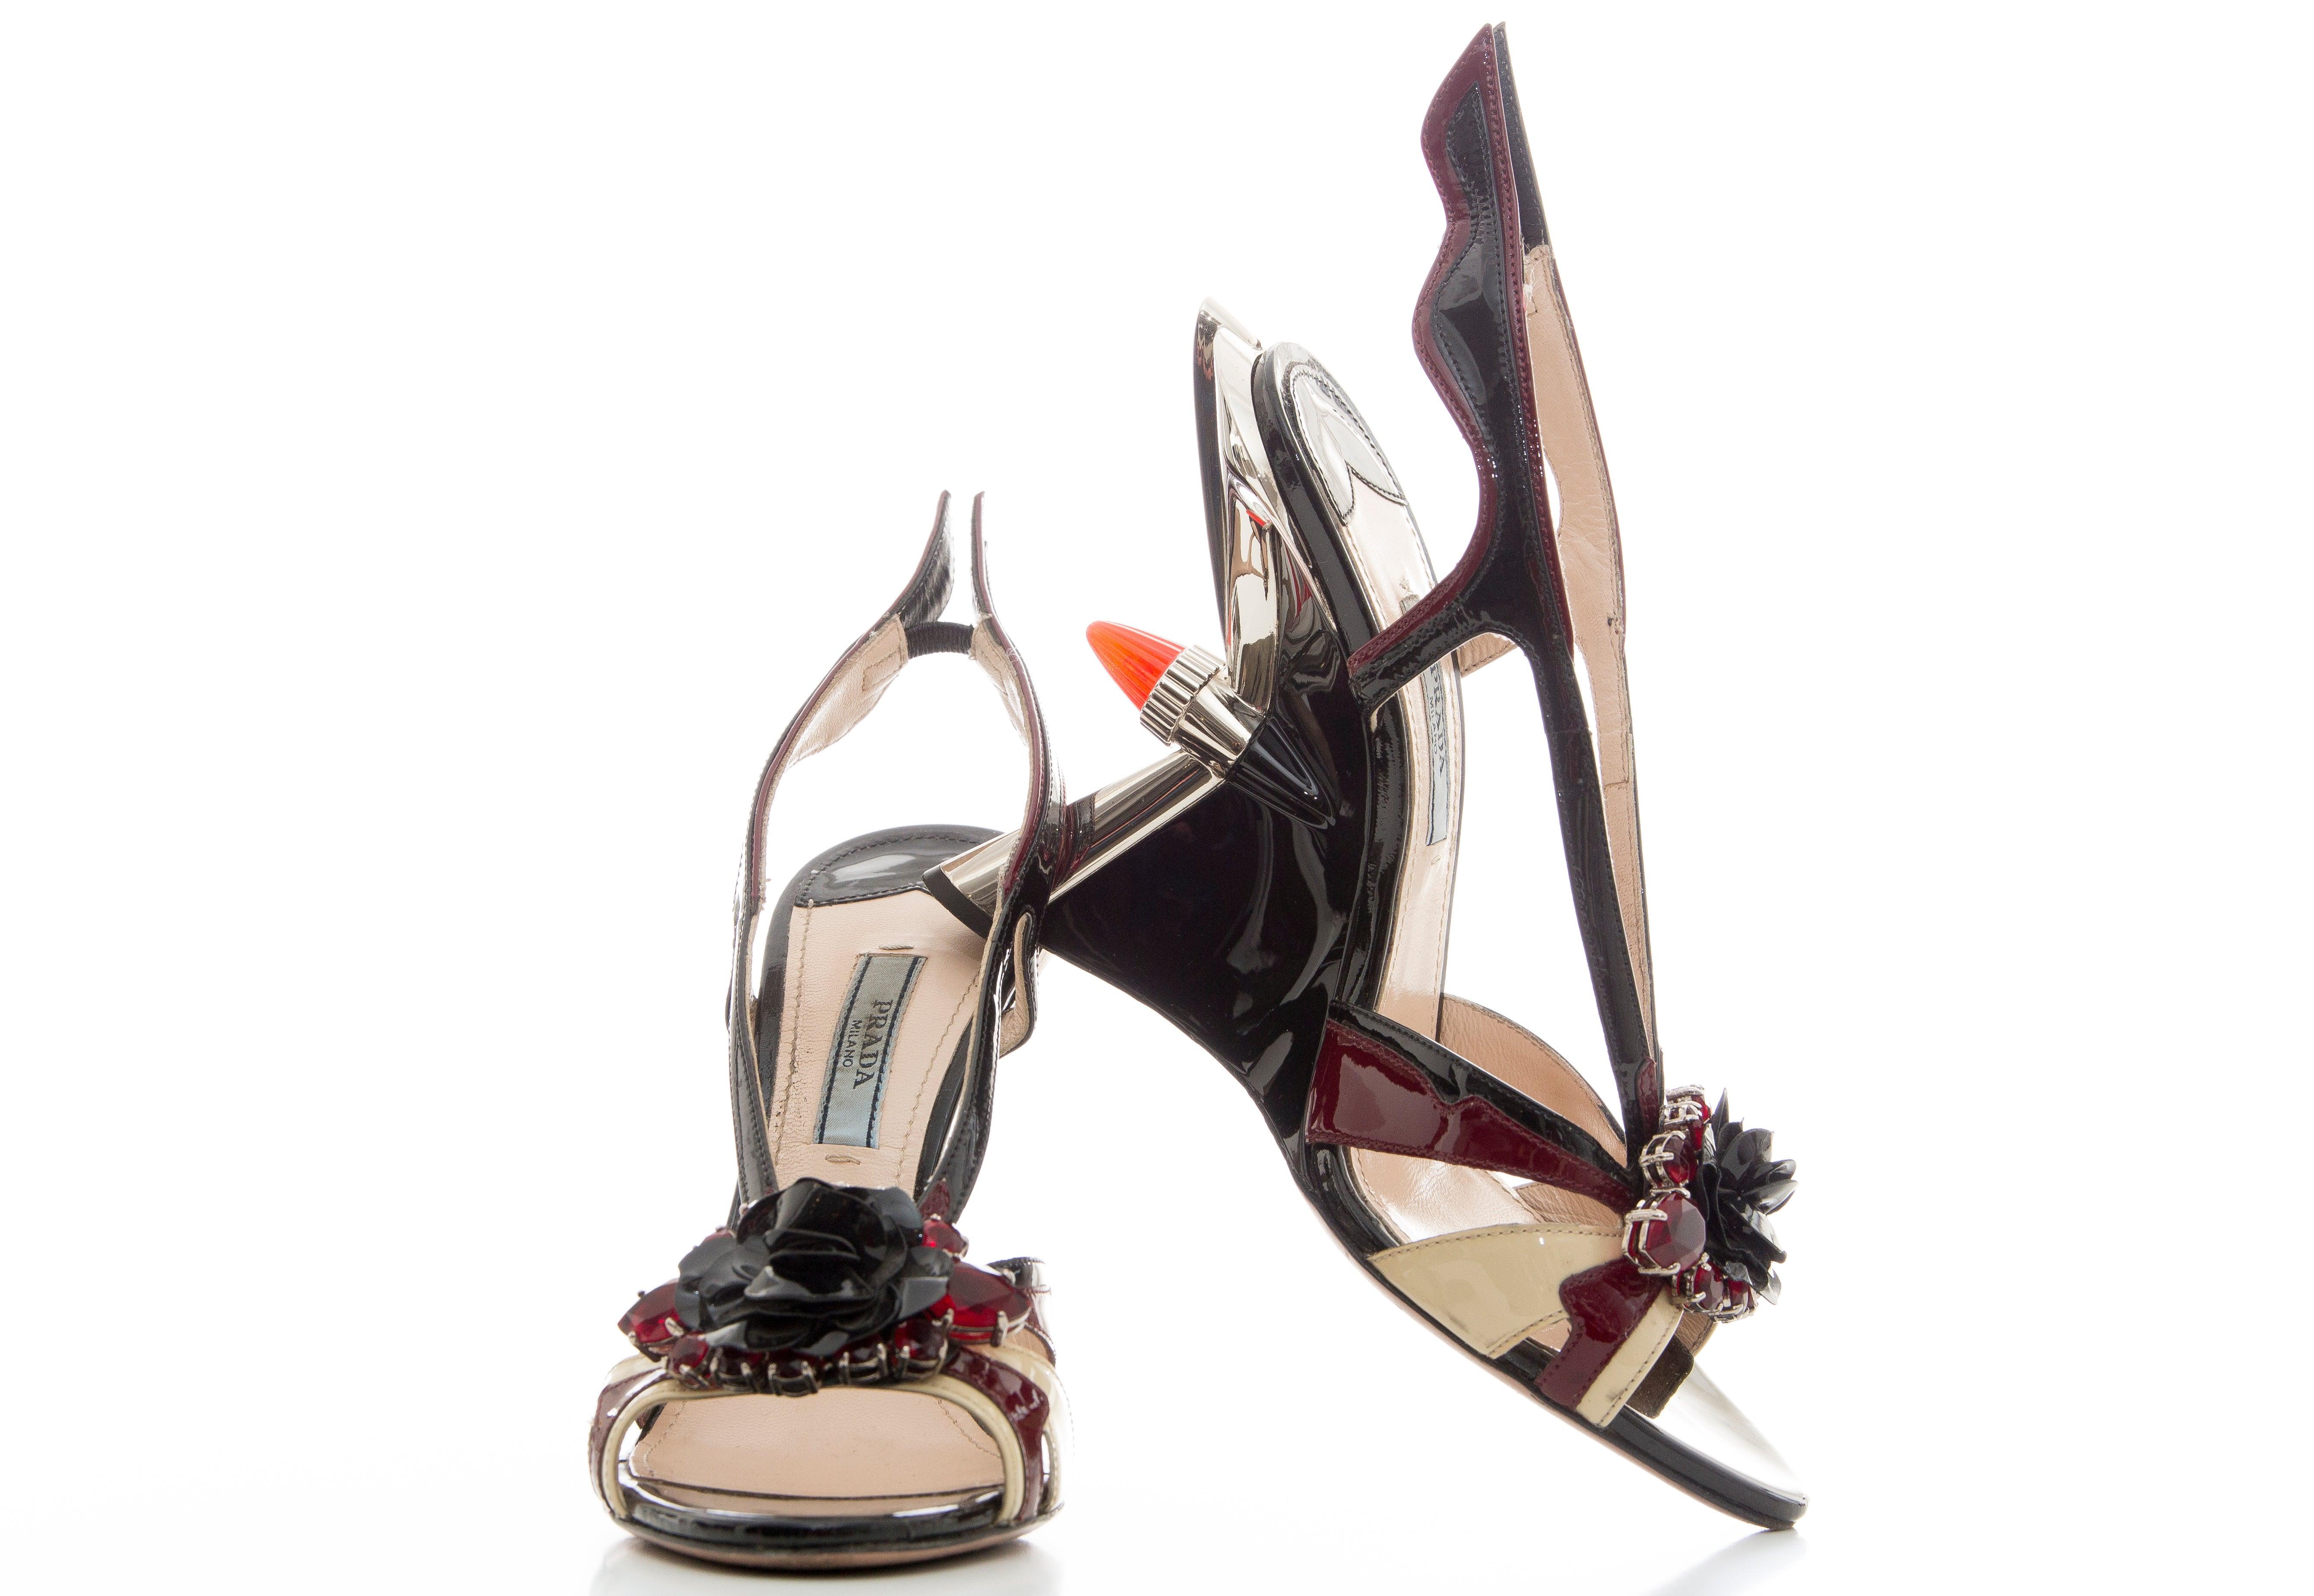 8b2e838b3561 Prada Jewel Taillight Wedge Sandal